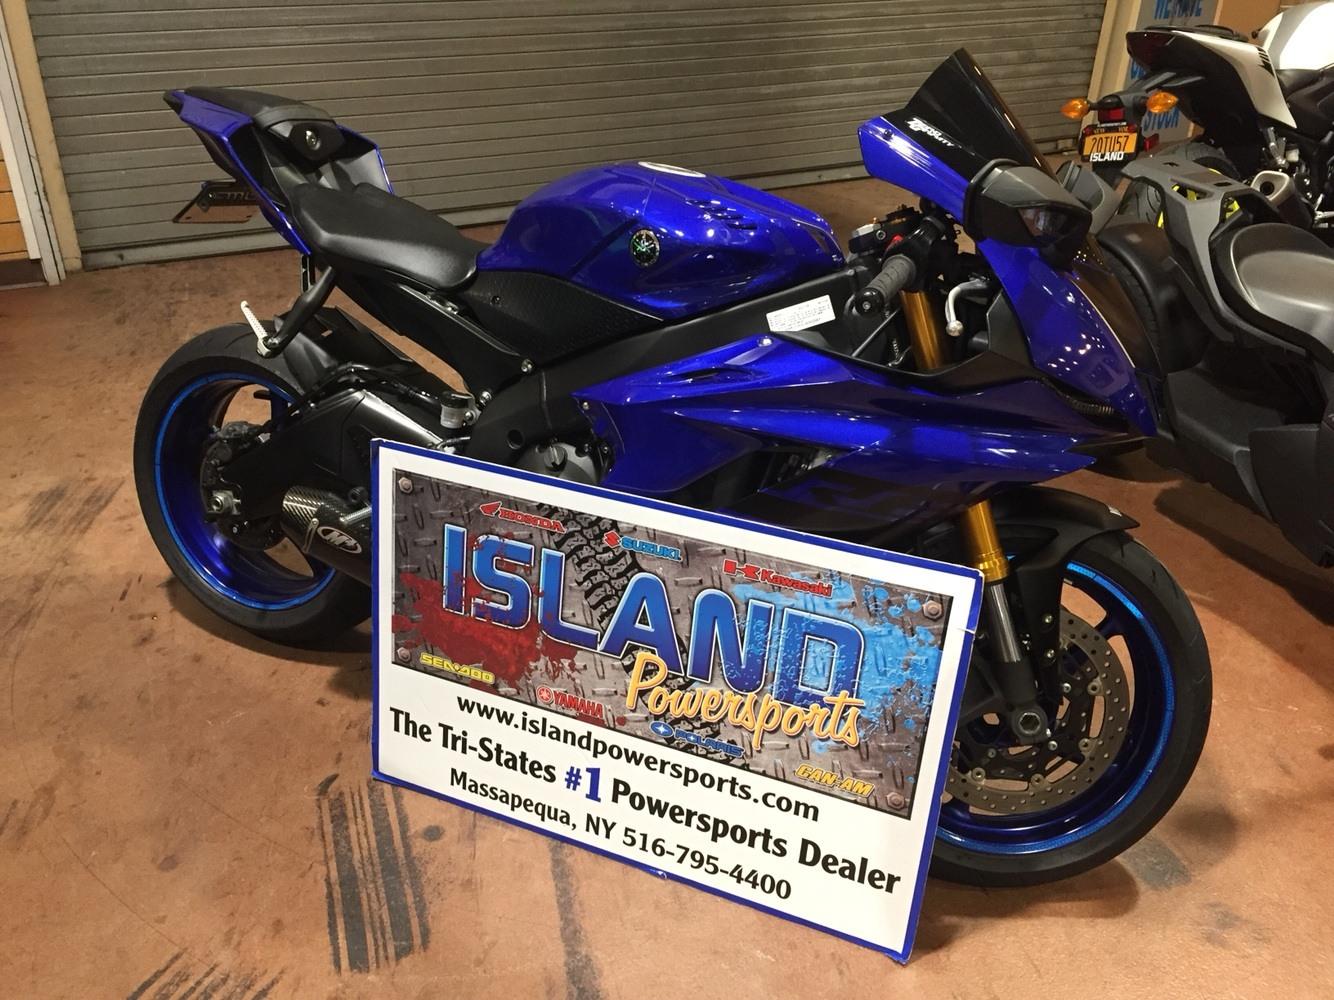 2018 Yamaha R6 for sale 6610